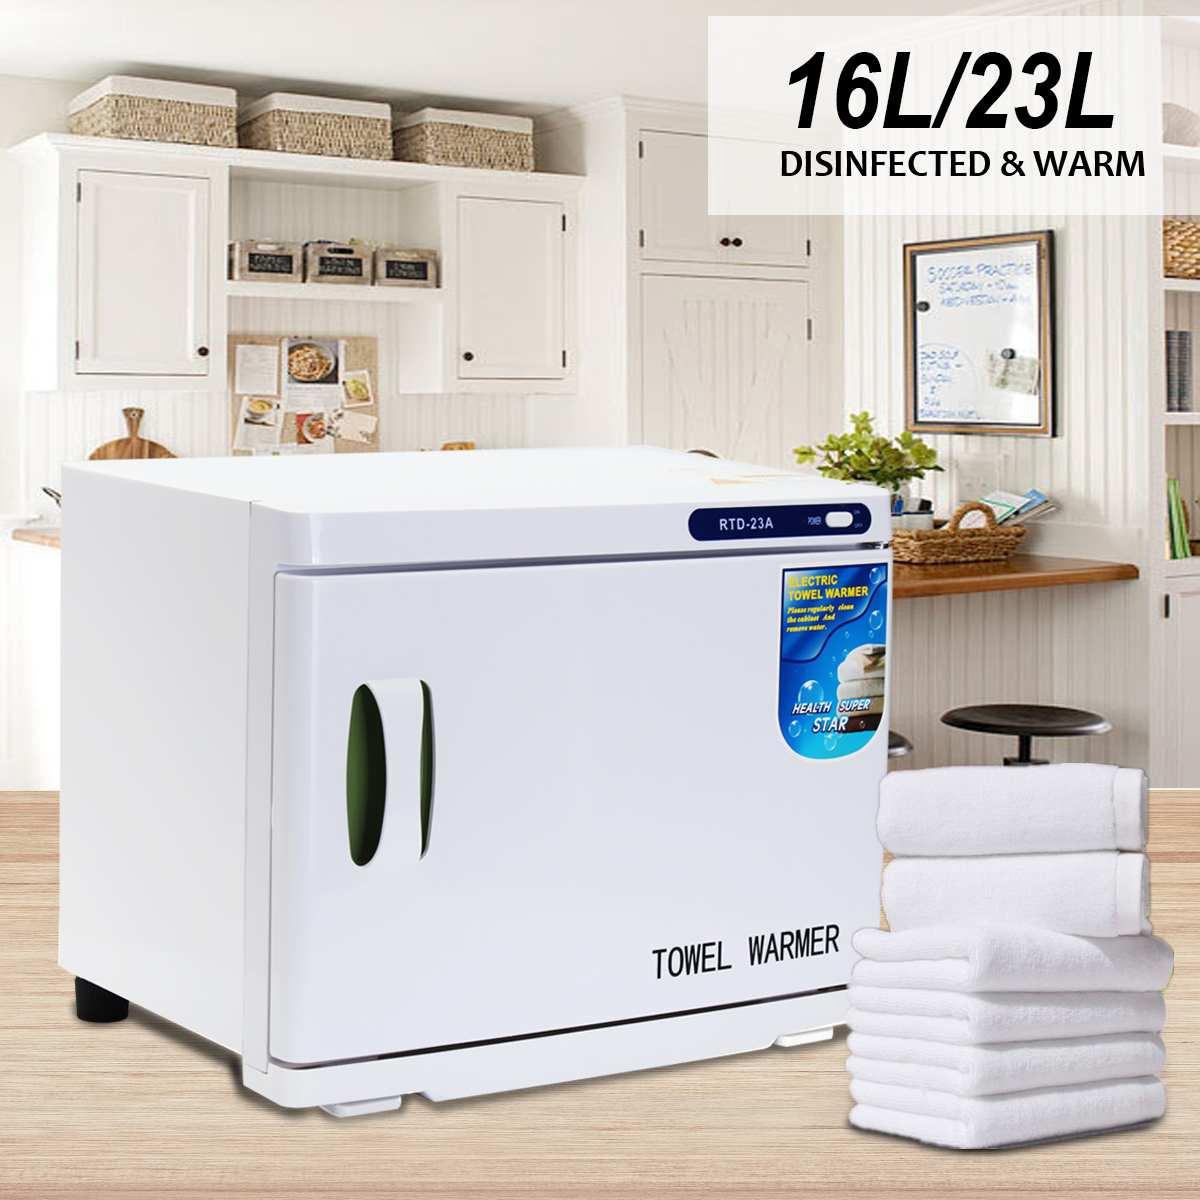 UV Light Electric Towel Warmer Towel Disinfection Cabinet Sterilizer Facial Salon Spa Towel Machine Hot Towel Cabinet 23L AU/US